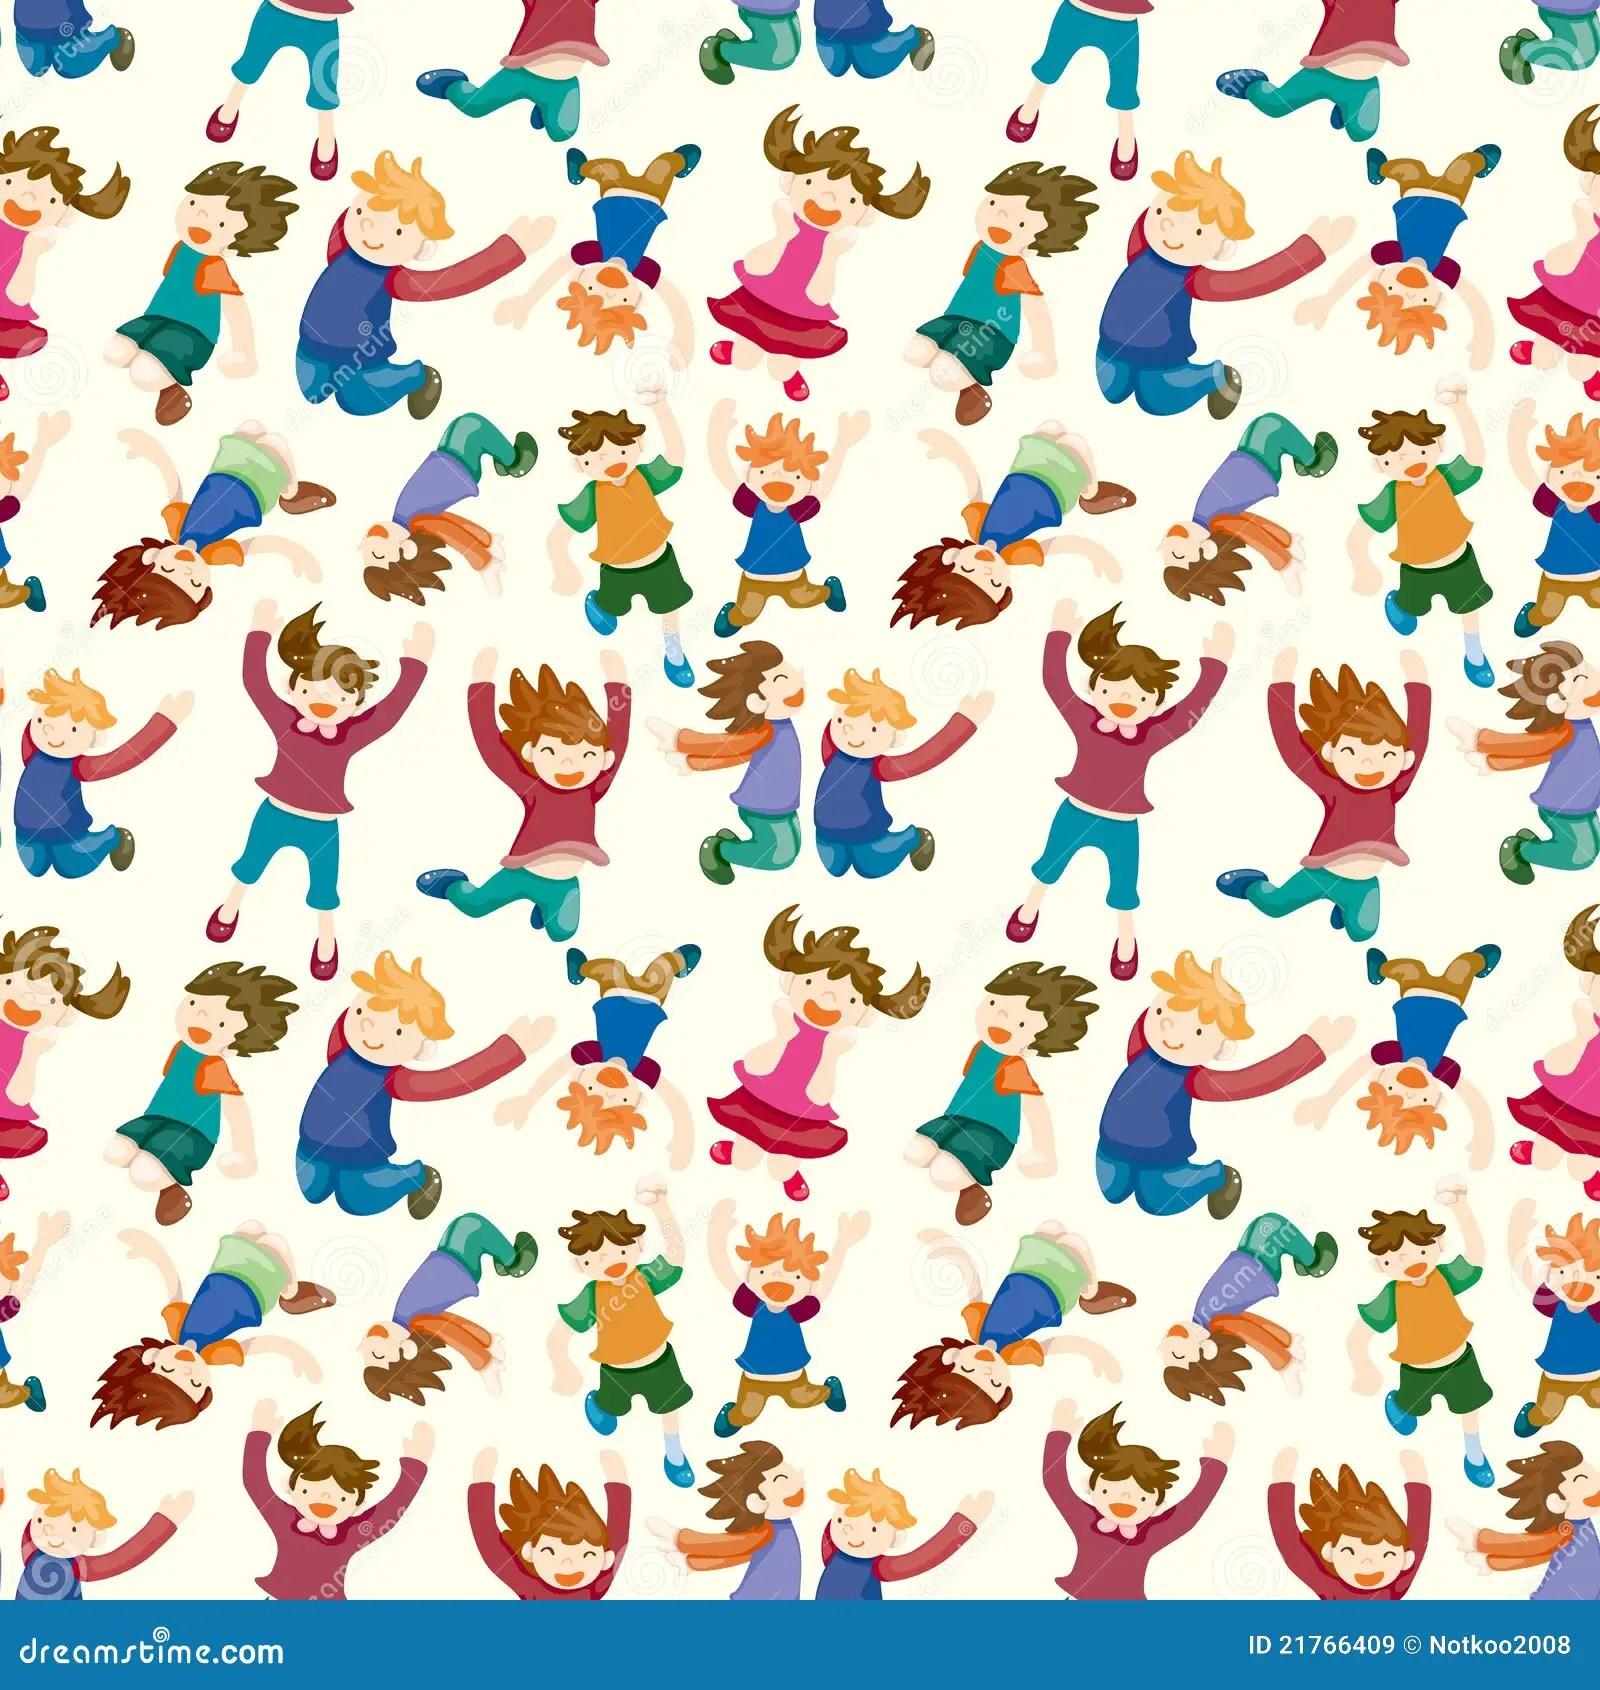 Cute Girl Cartoon Wallpaper Free Download Cartoon Child Jump Seamless Pattern Royalty Free Stock